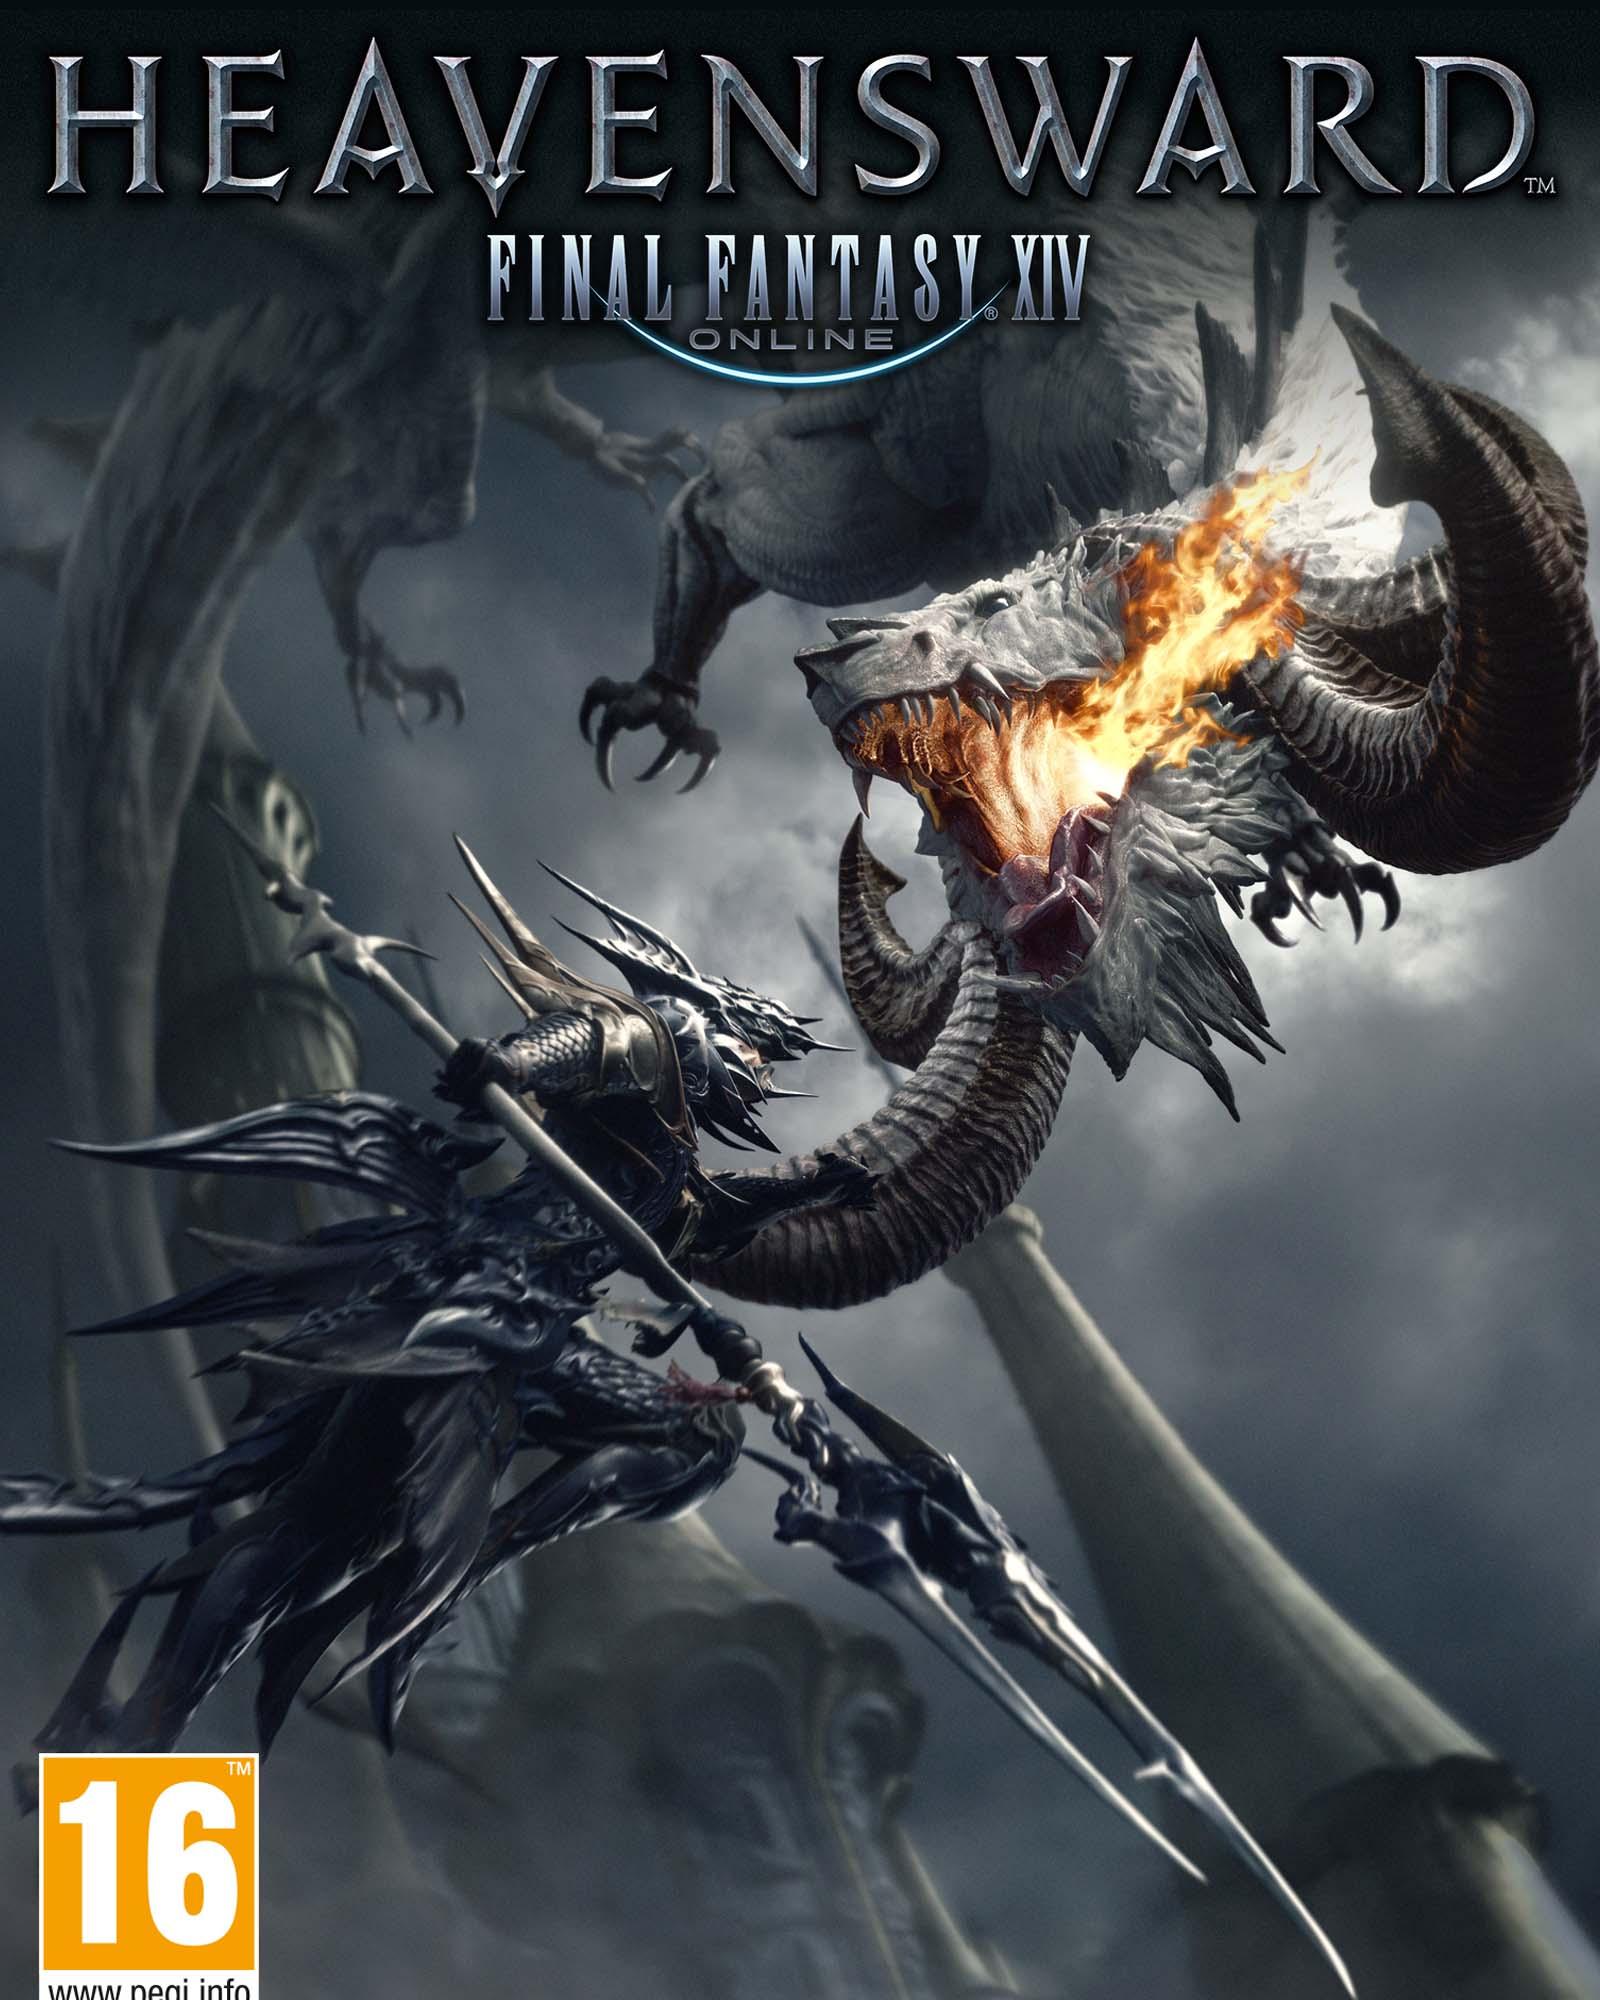 Final Fantasy XIV Online Heavensward